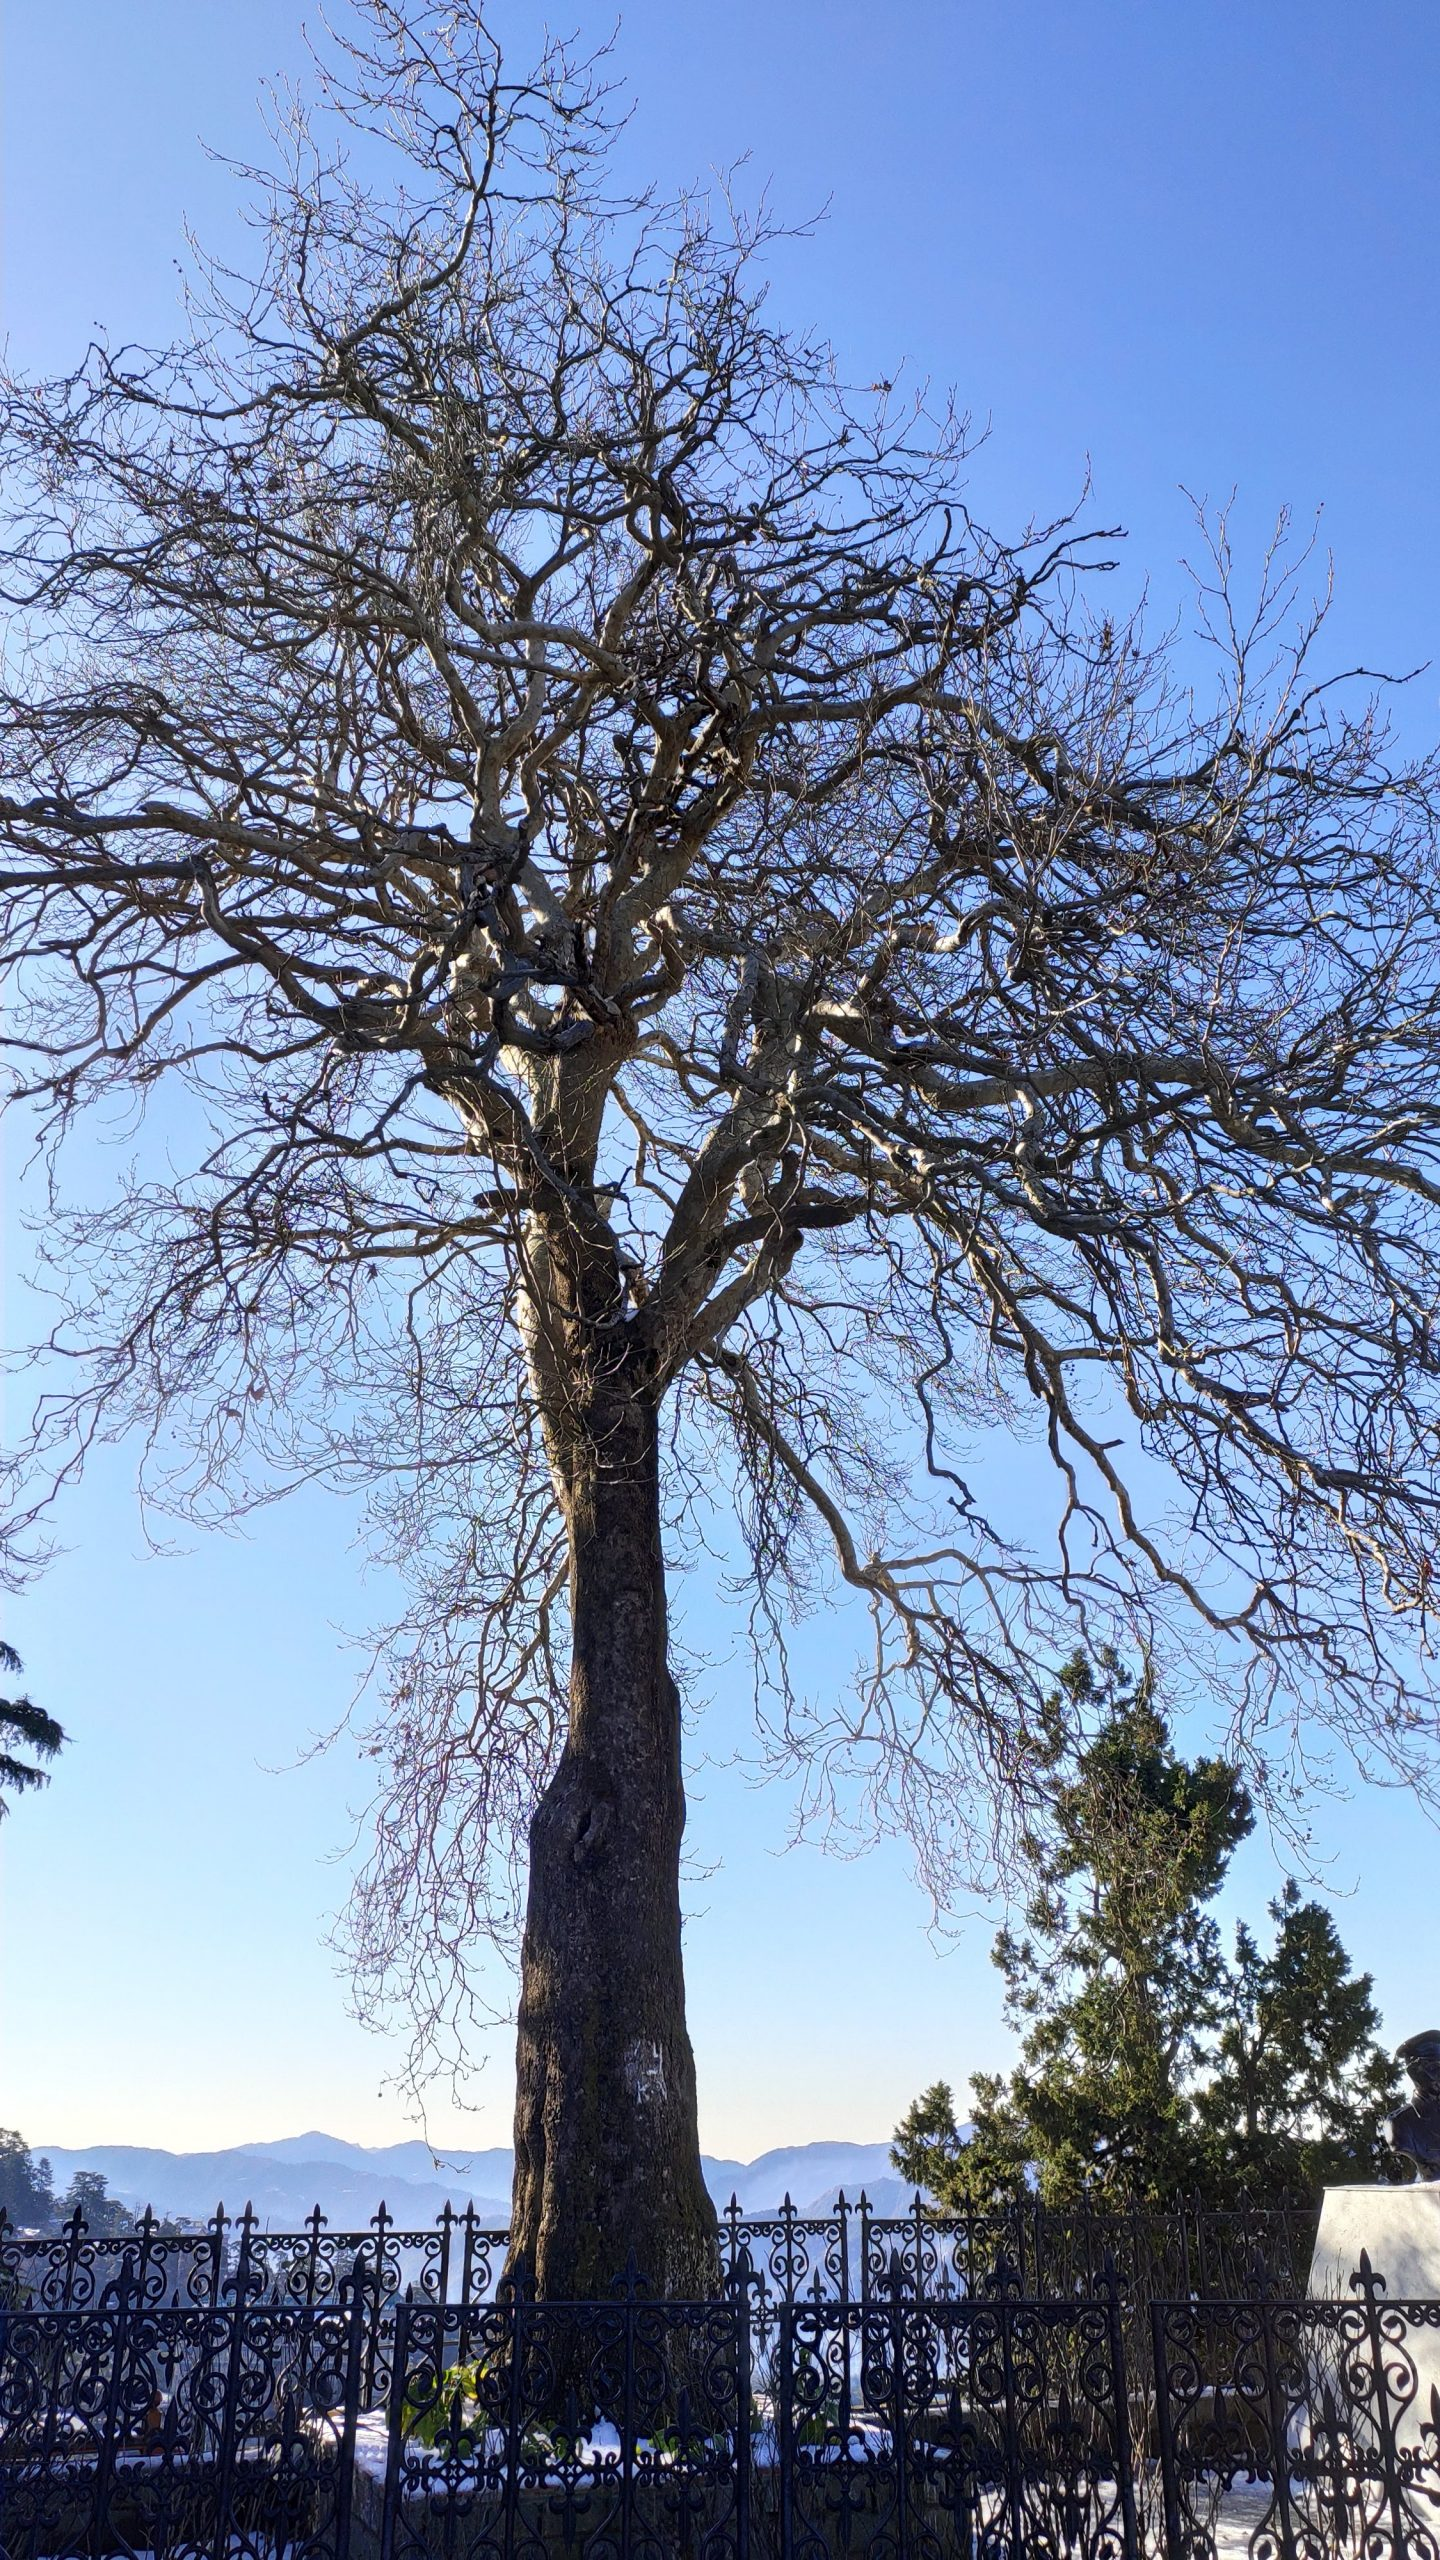 A big bare tree